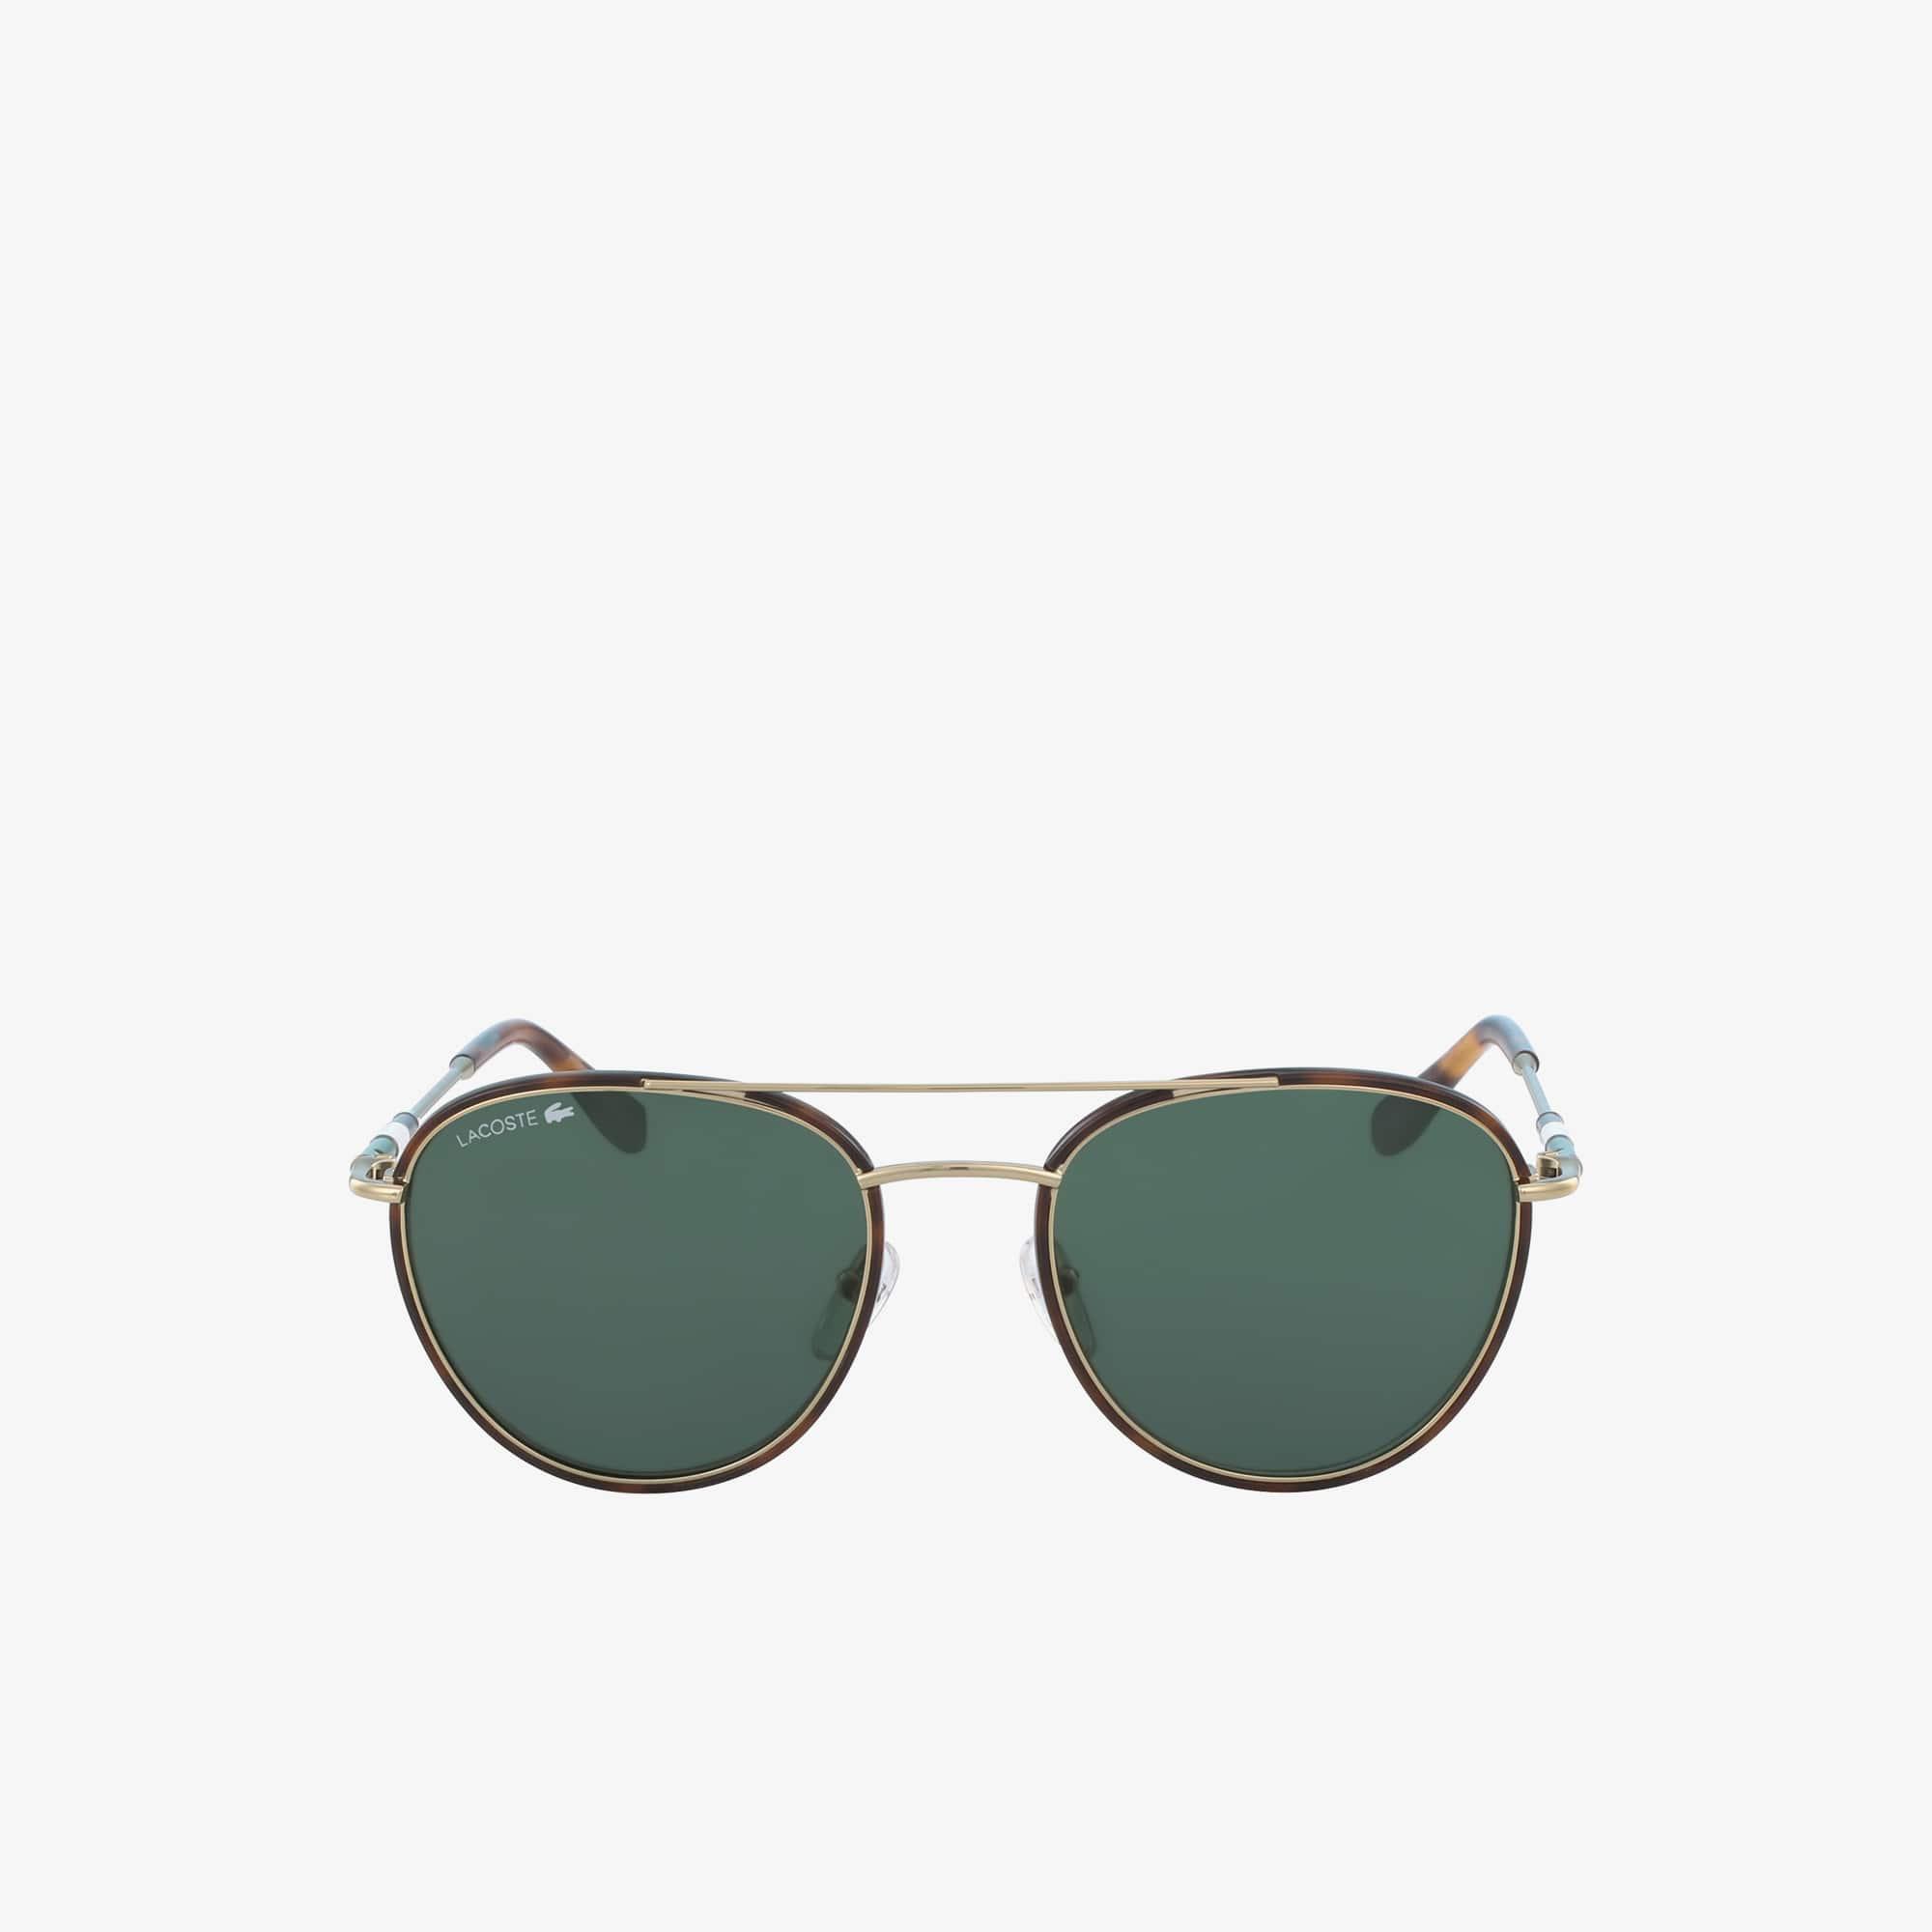 Unisex Color Block - Heritage Sonnenbrille mit Metallrahmen